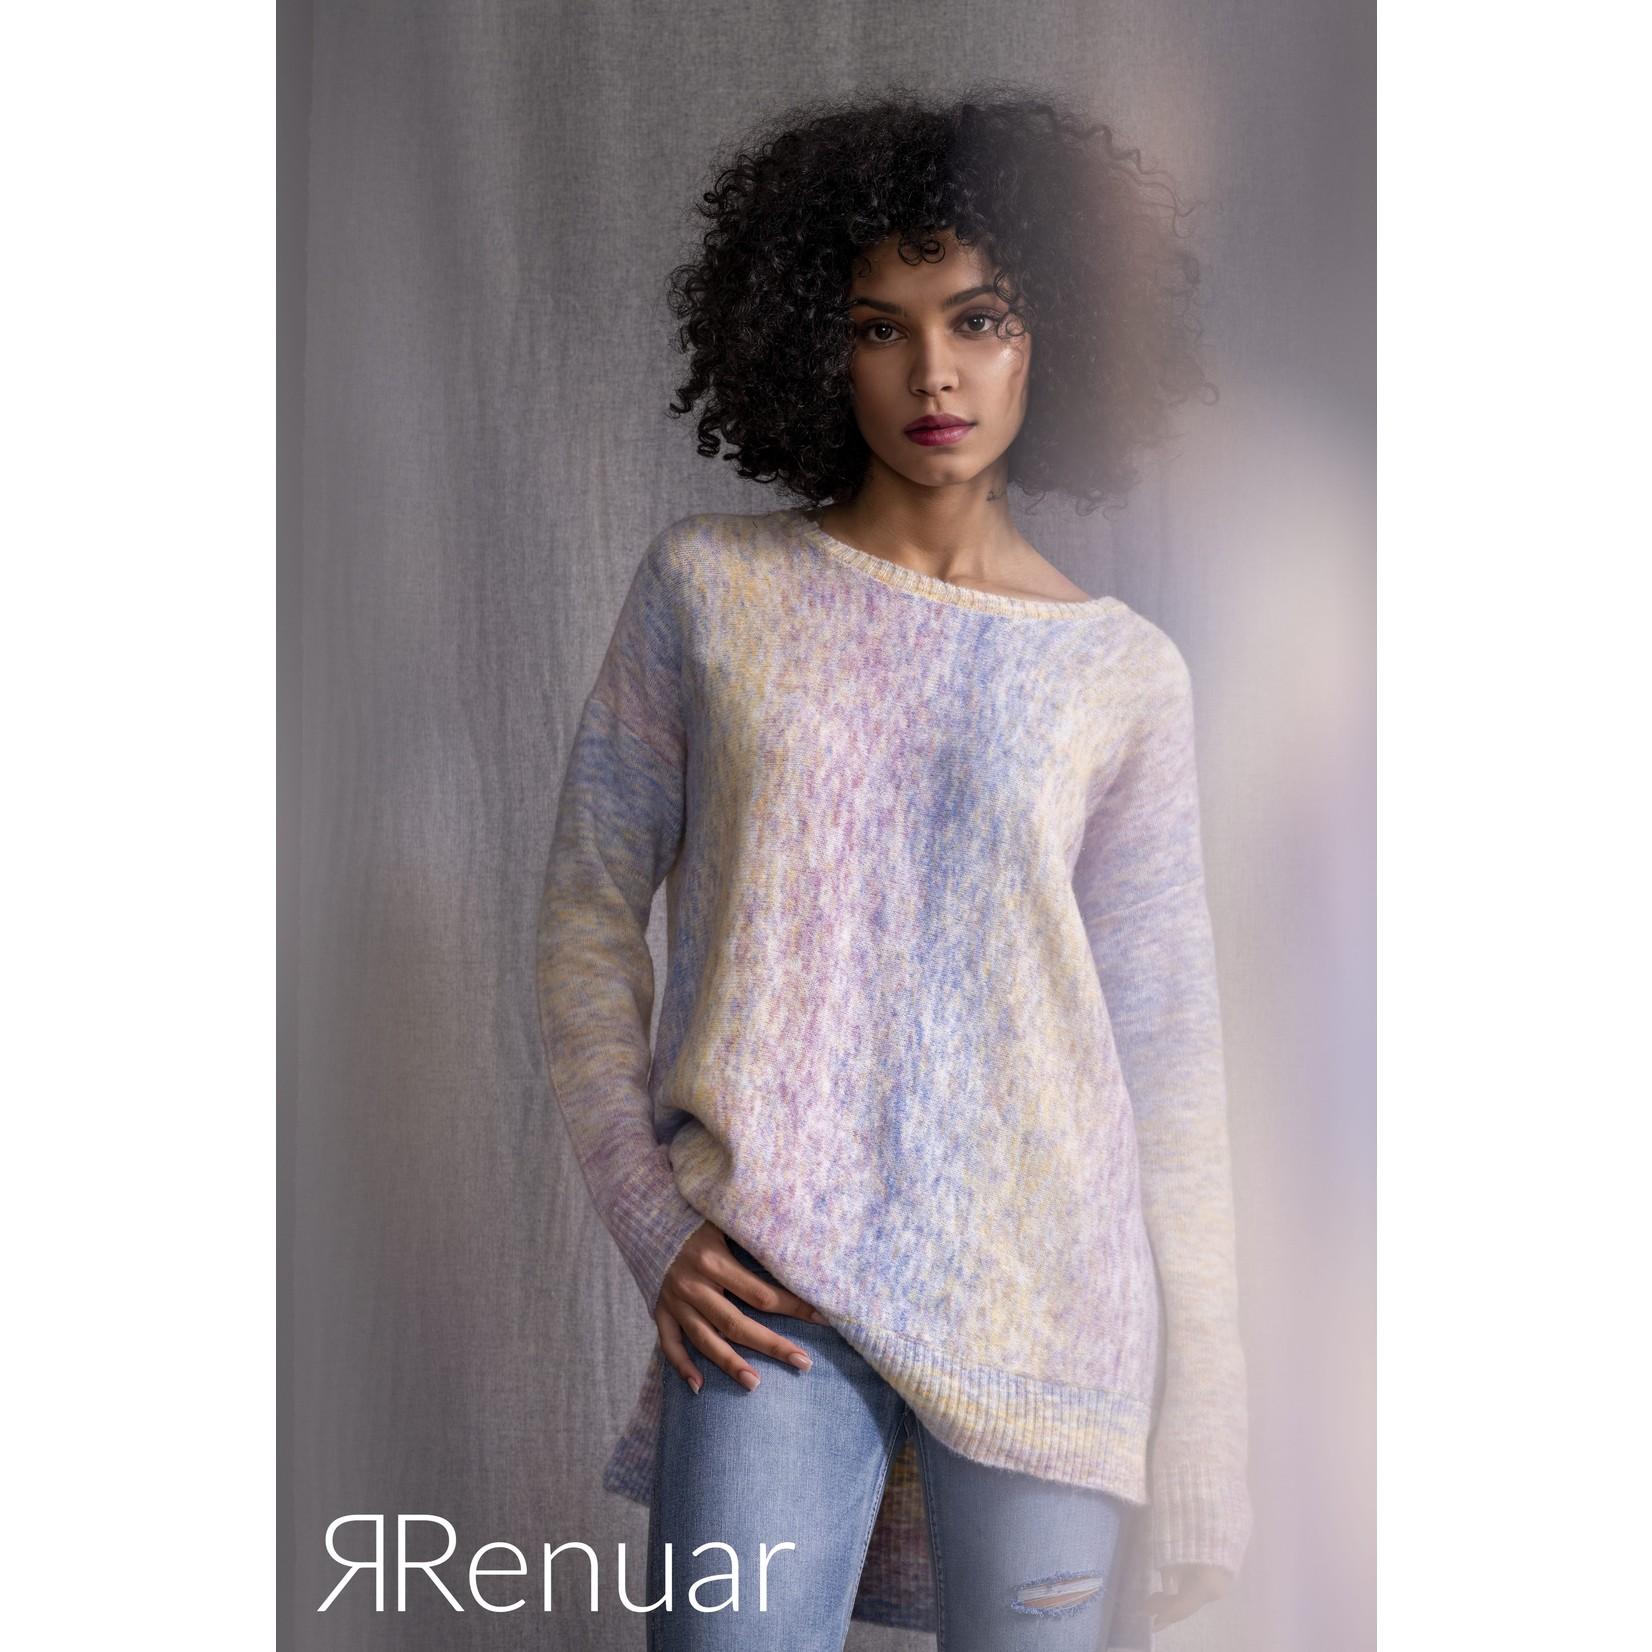 Renuar Knit Sweater